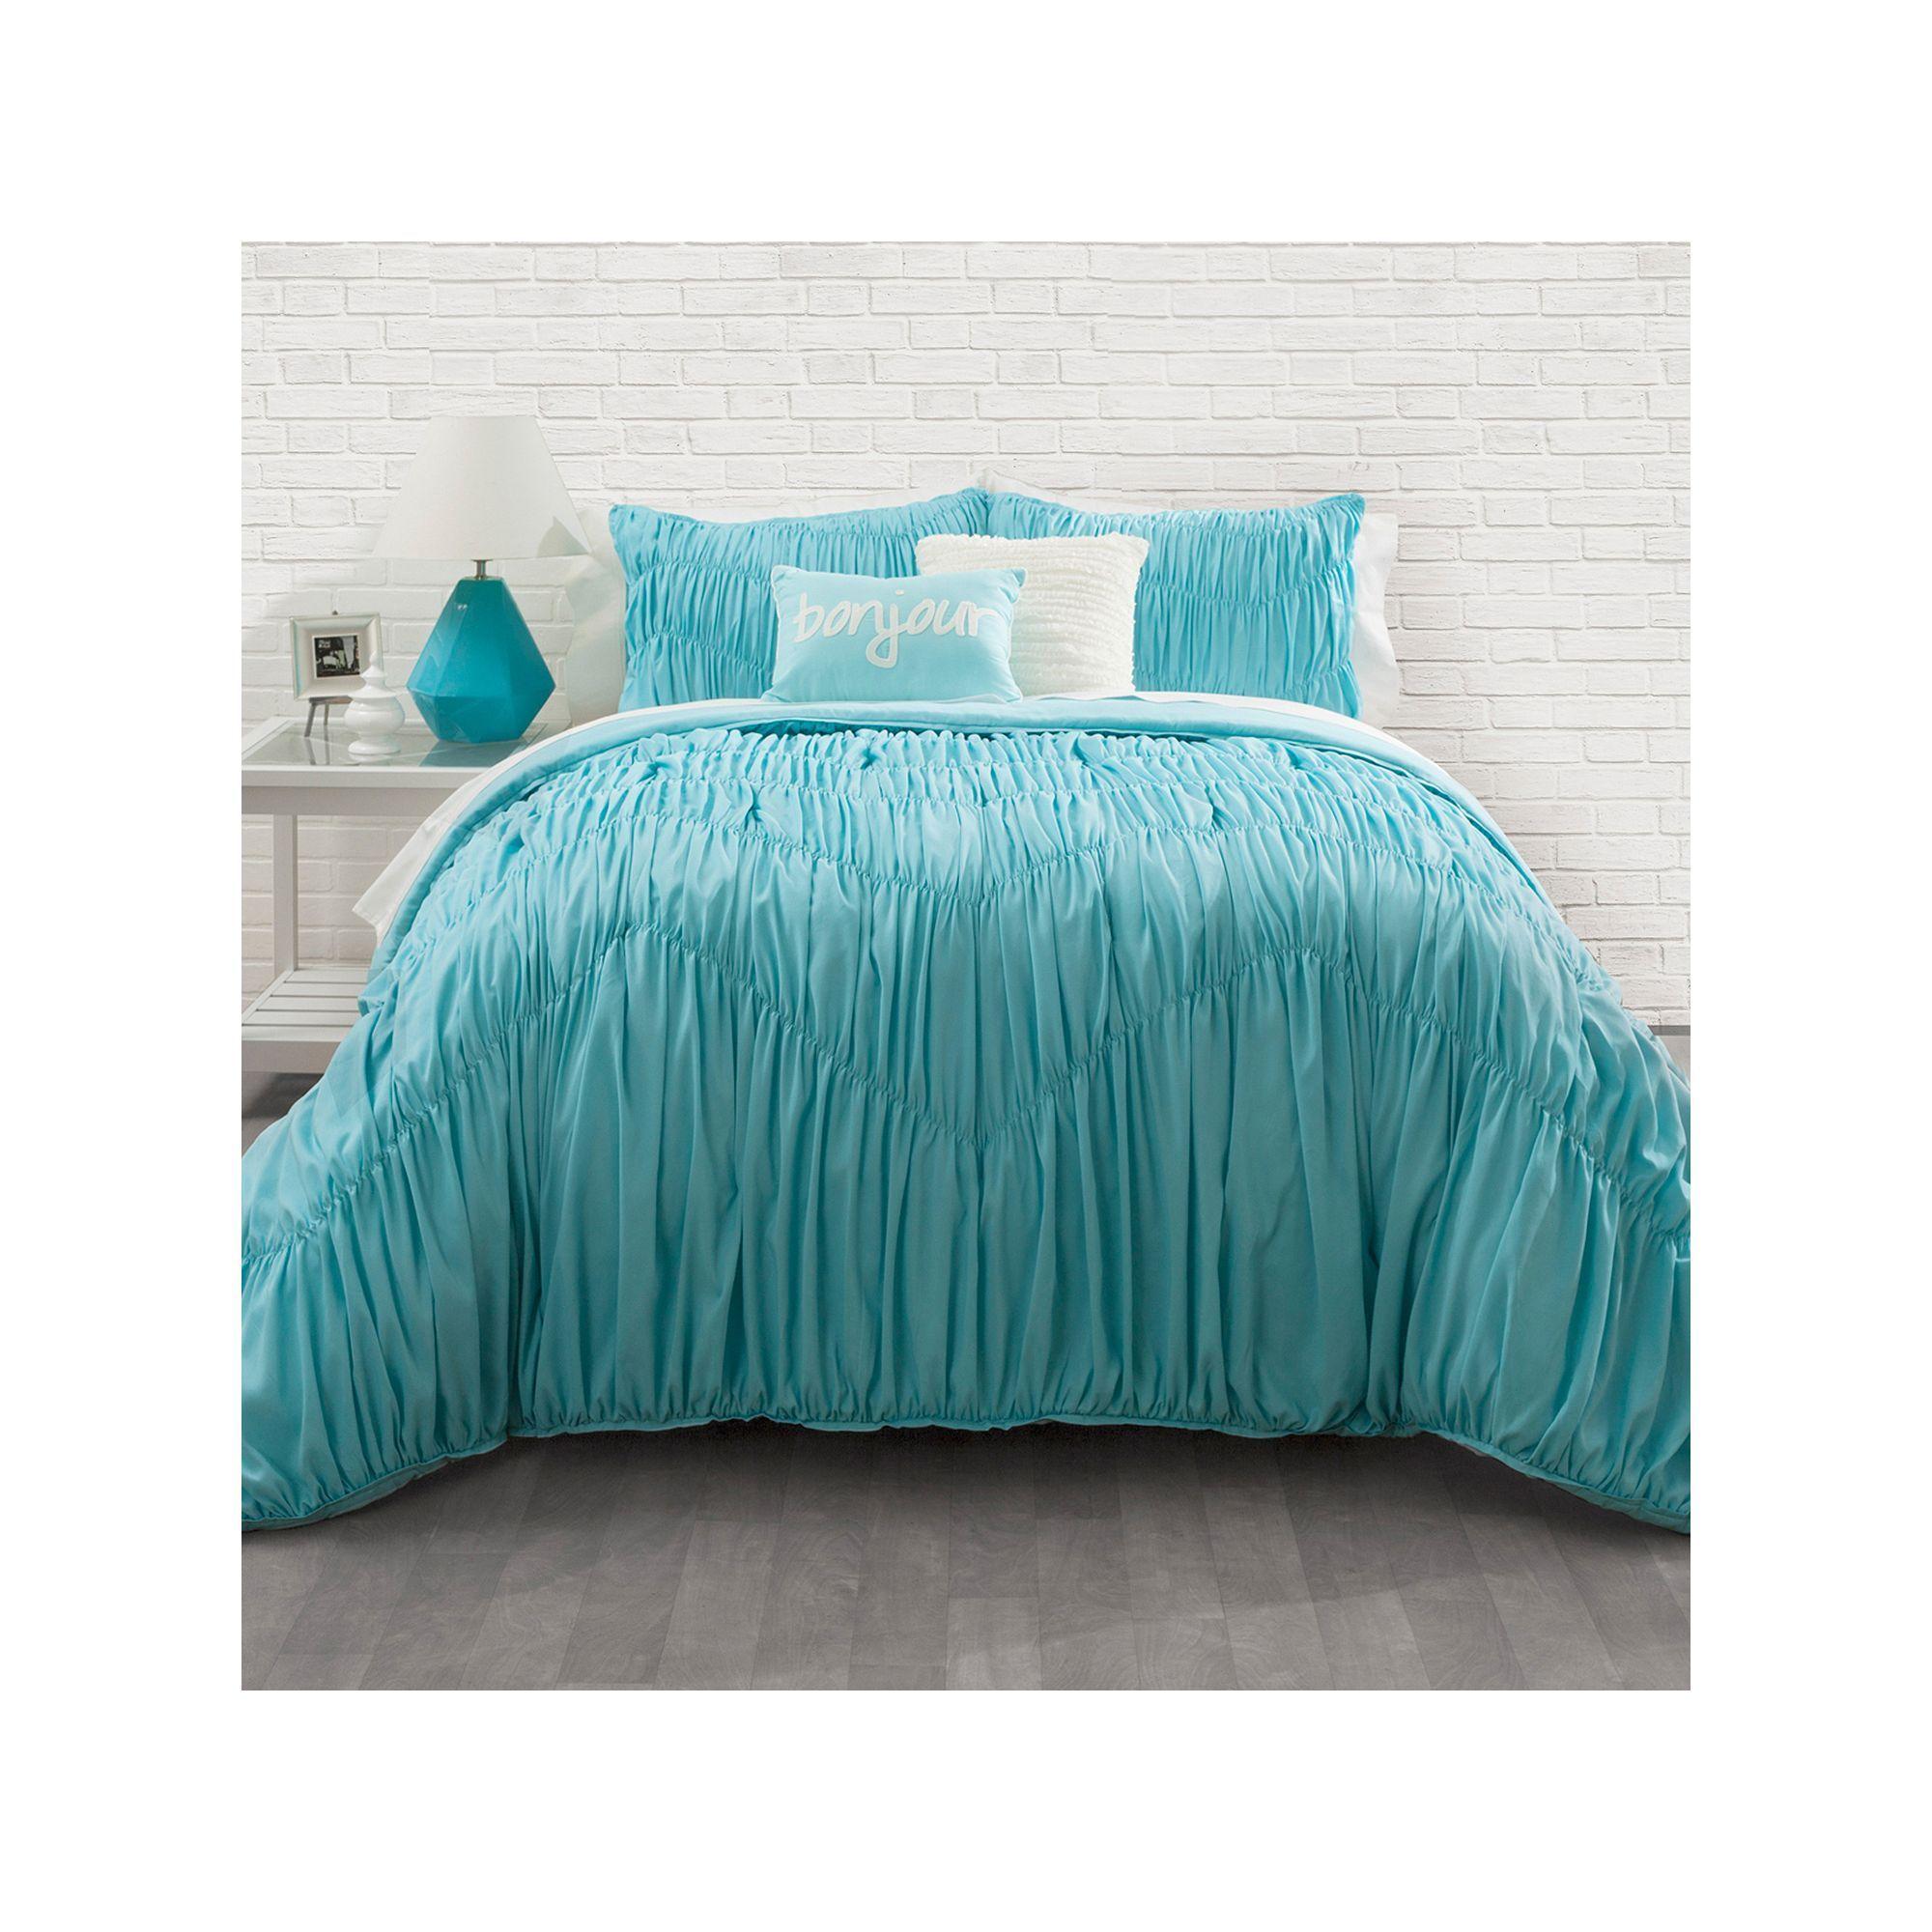 seventeen aqua rouched chevron comforter set, blue | chevron